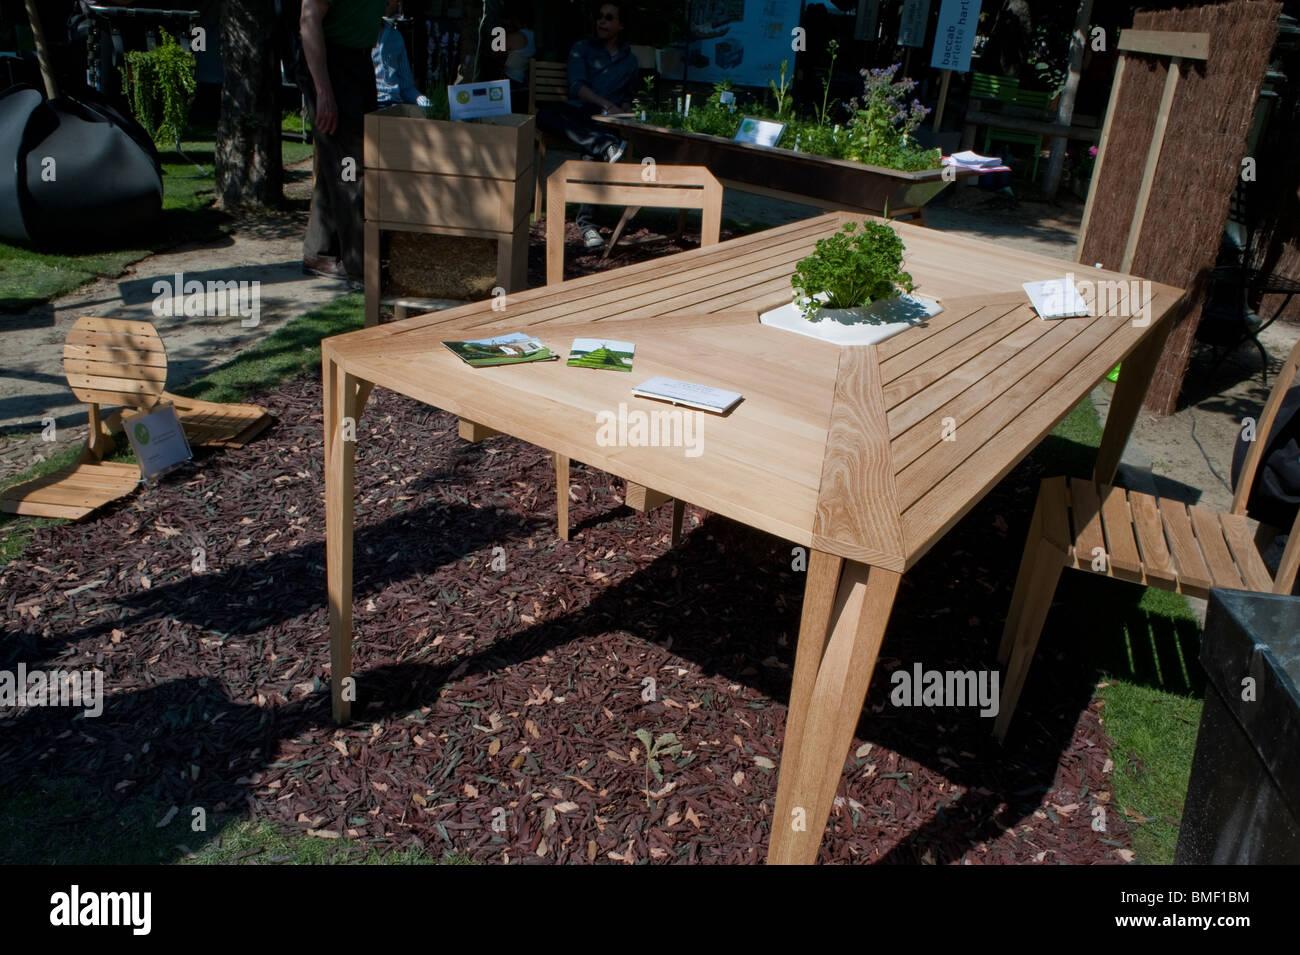 Wooden Garden Furniture Table Chairs Stockfotos Wooden Garden